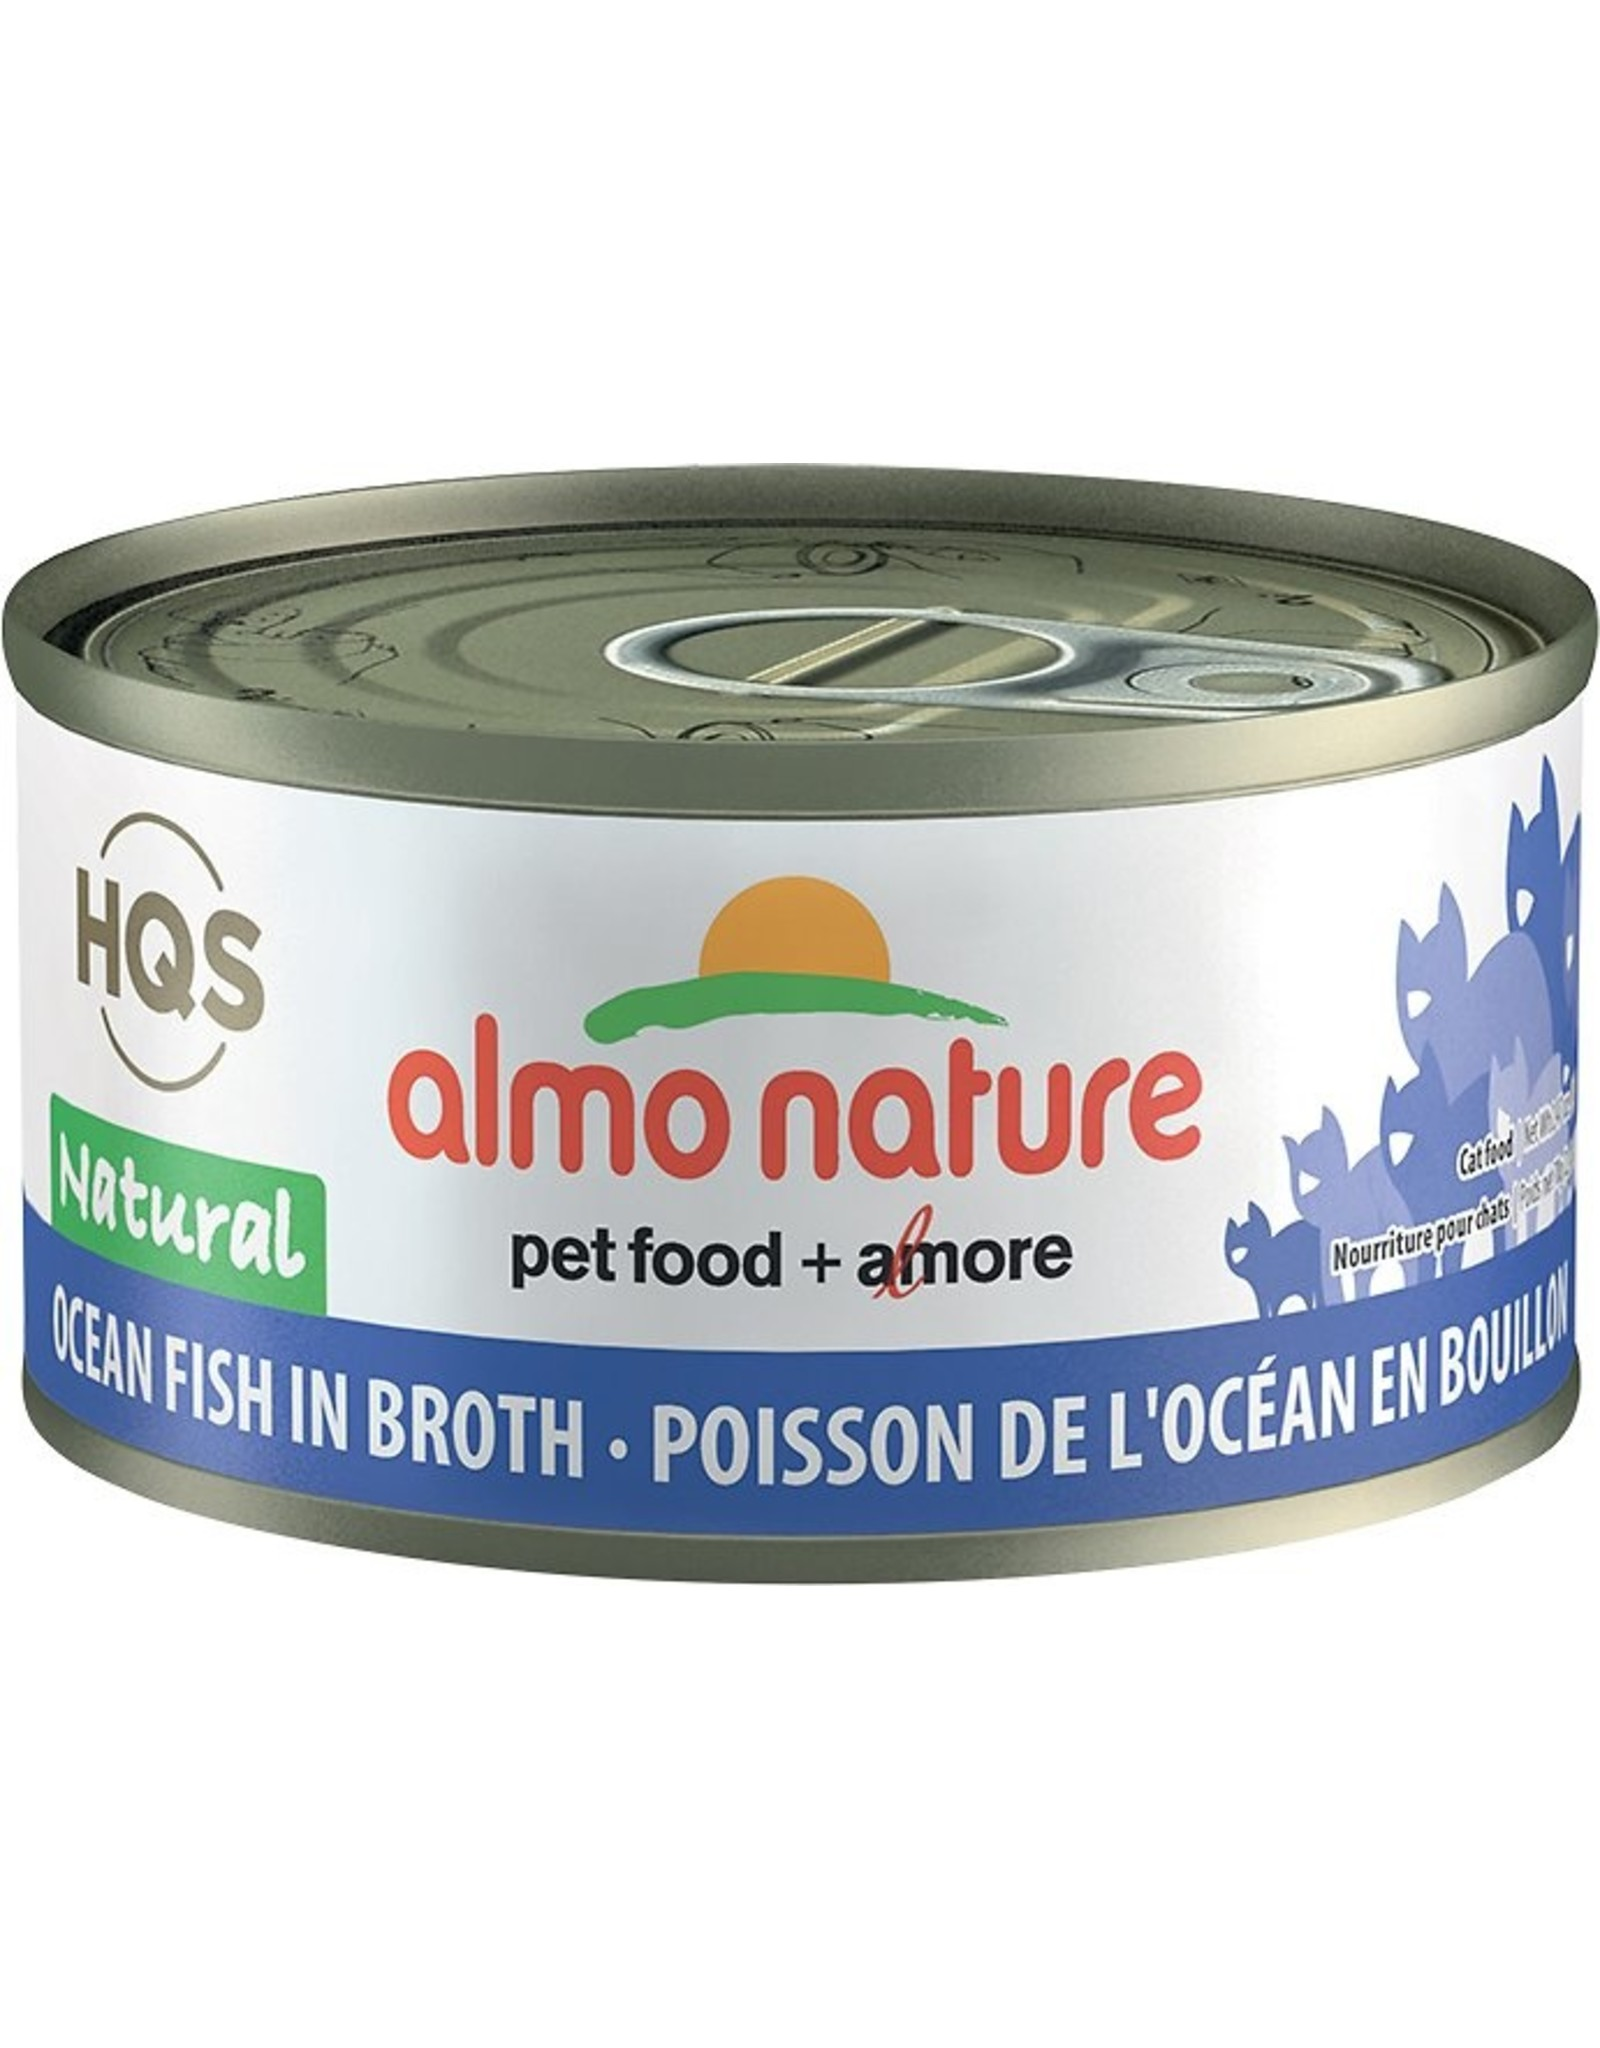 almo Almo Nature Natural Ocean Fish in Broth Cat 70g